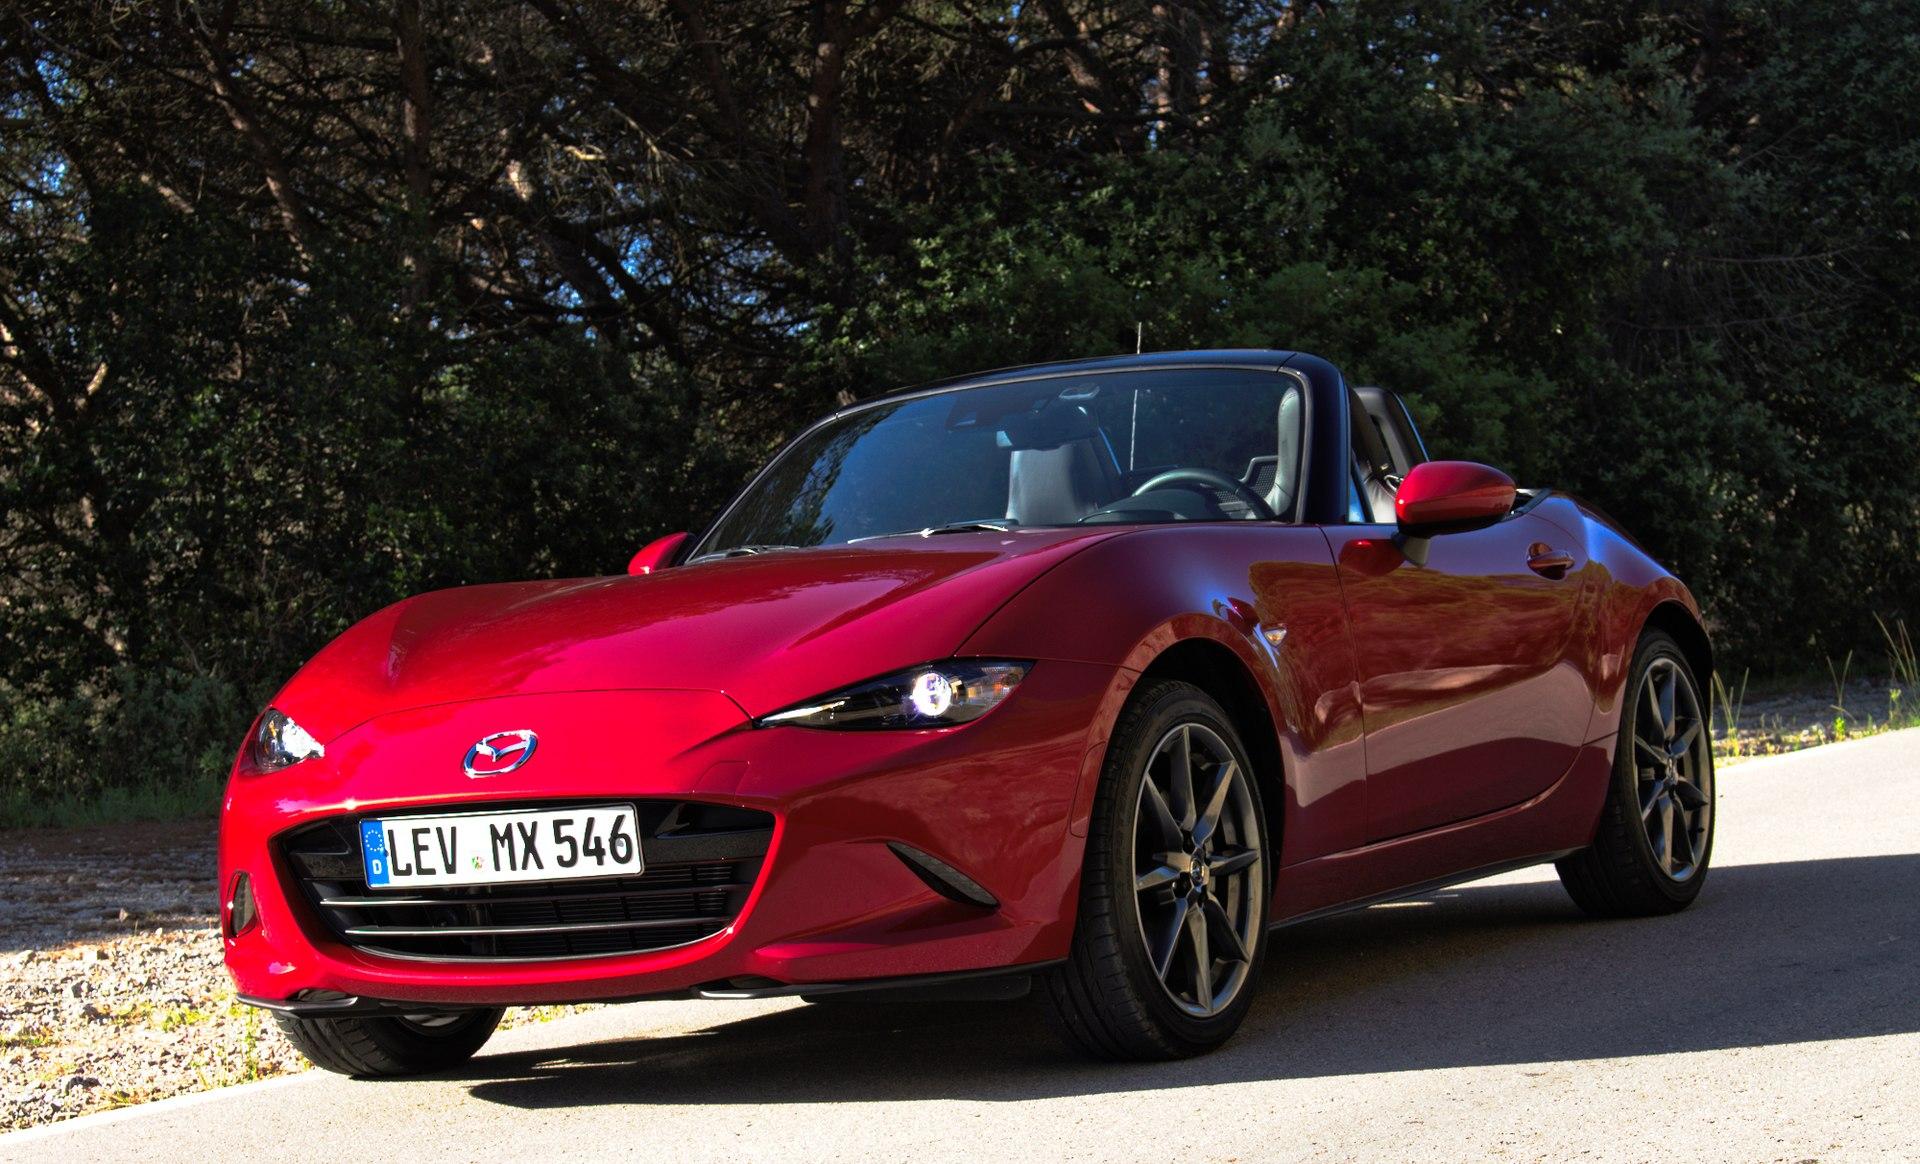 2015 Mazda MX-5 ND 2.0 SKYACTIV-G 160 i-ELOOP Rubinrot-Metallic Vorderansicht.jpg